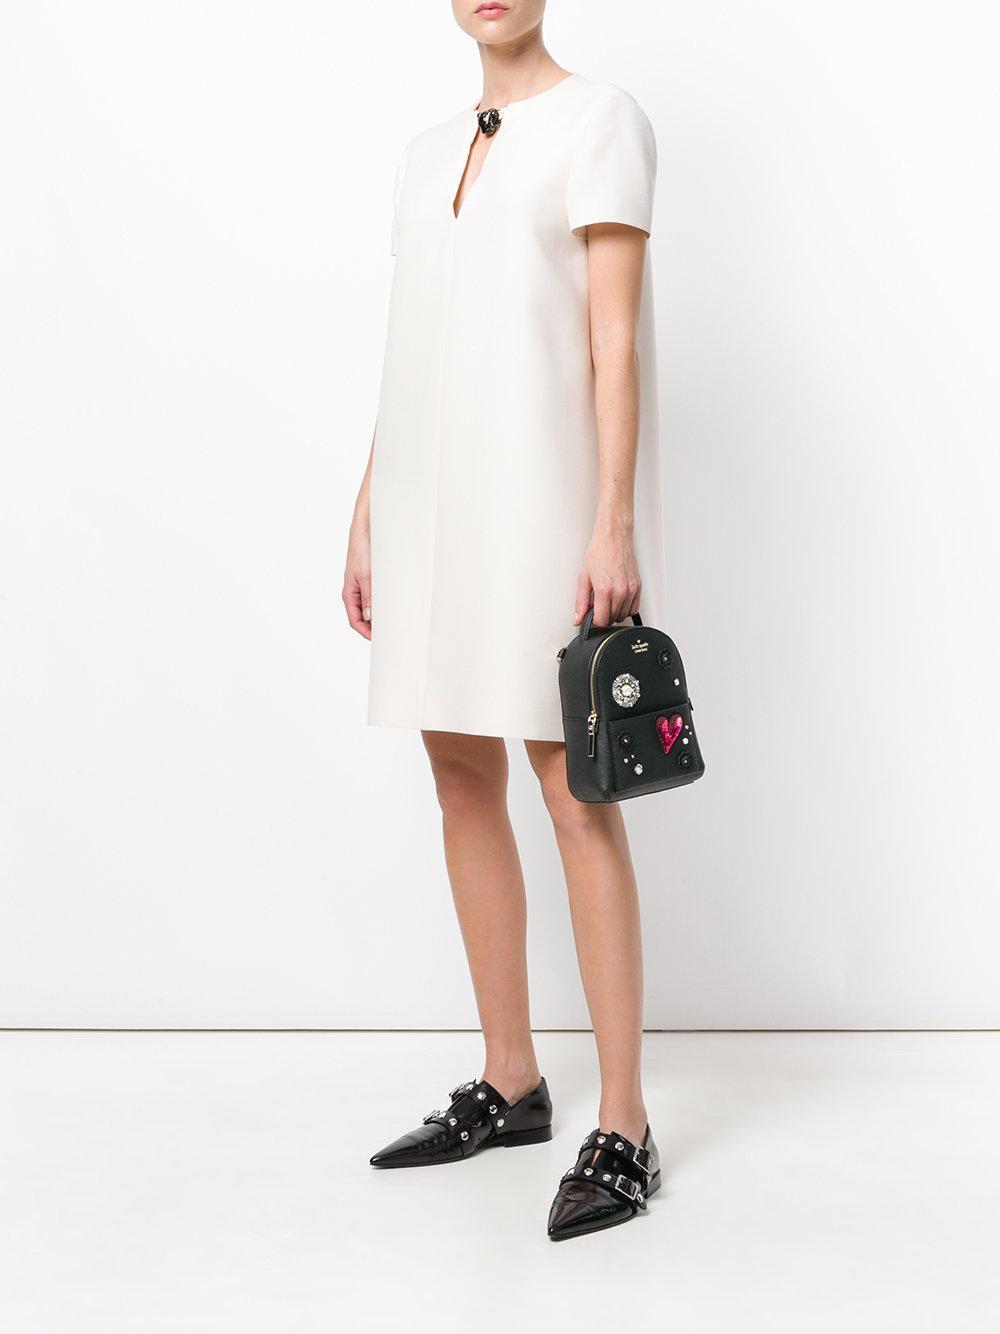 Kate Spade Synthetic Mini Appliqué Embellished Backpack in Black